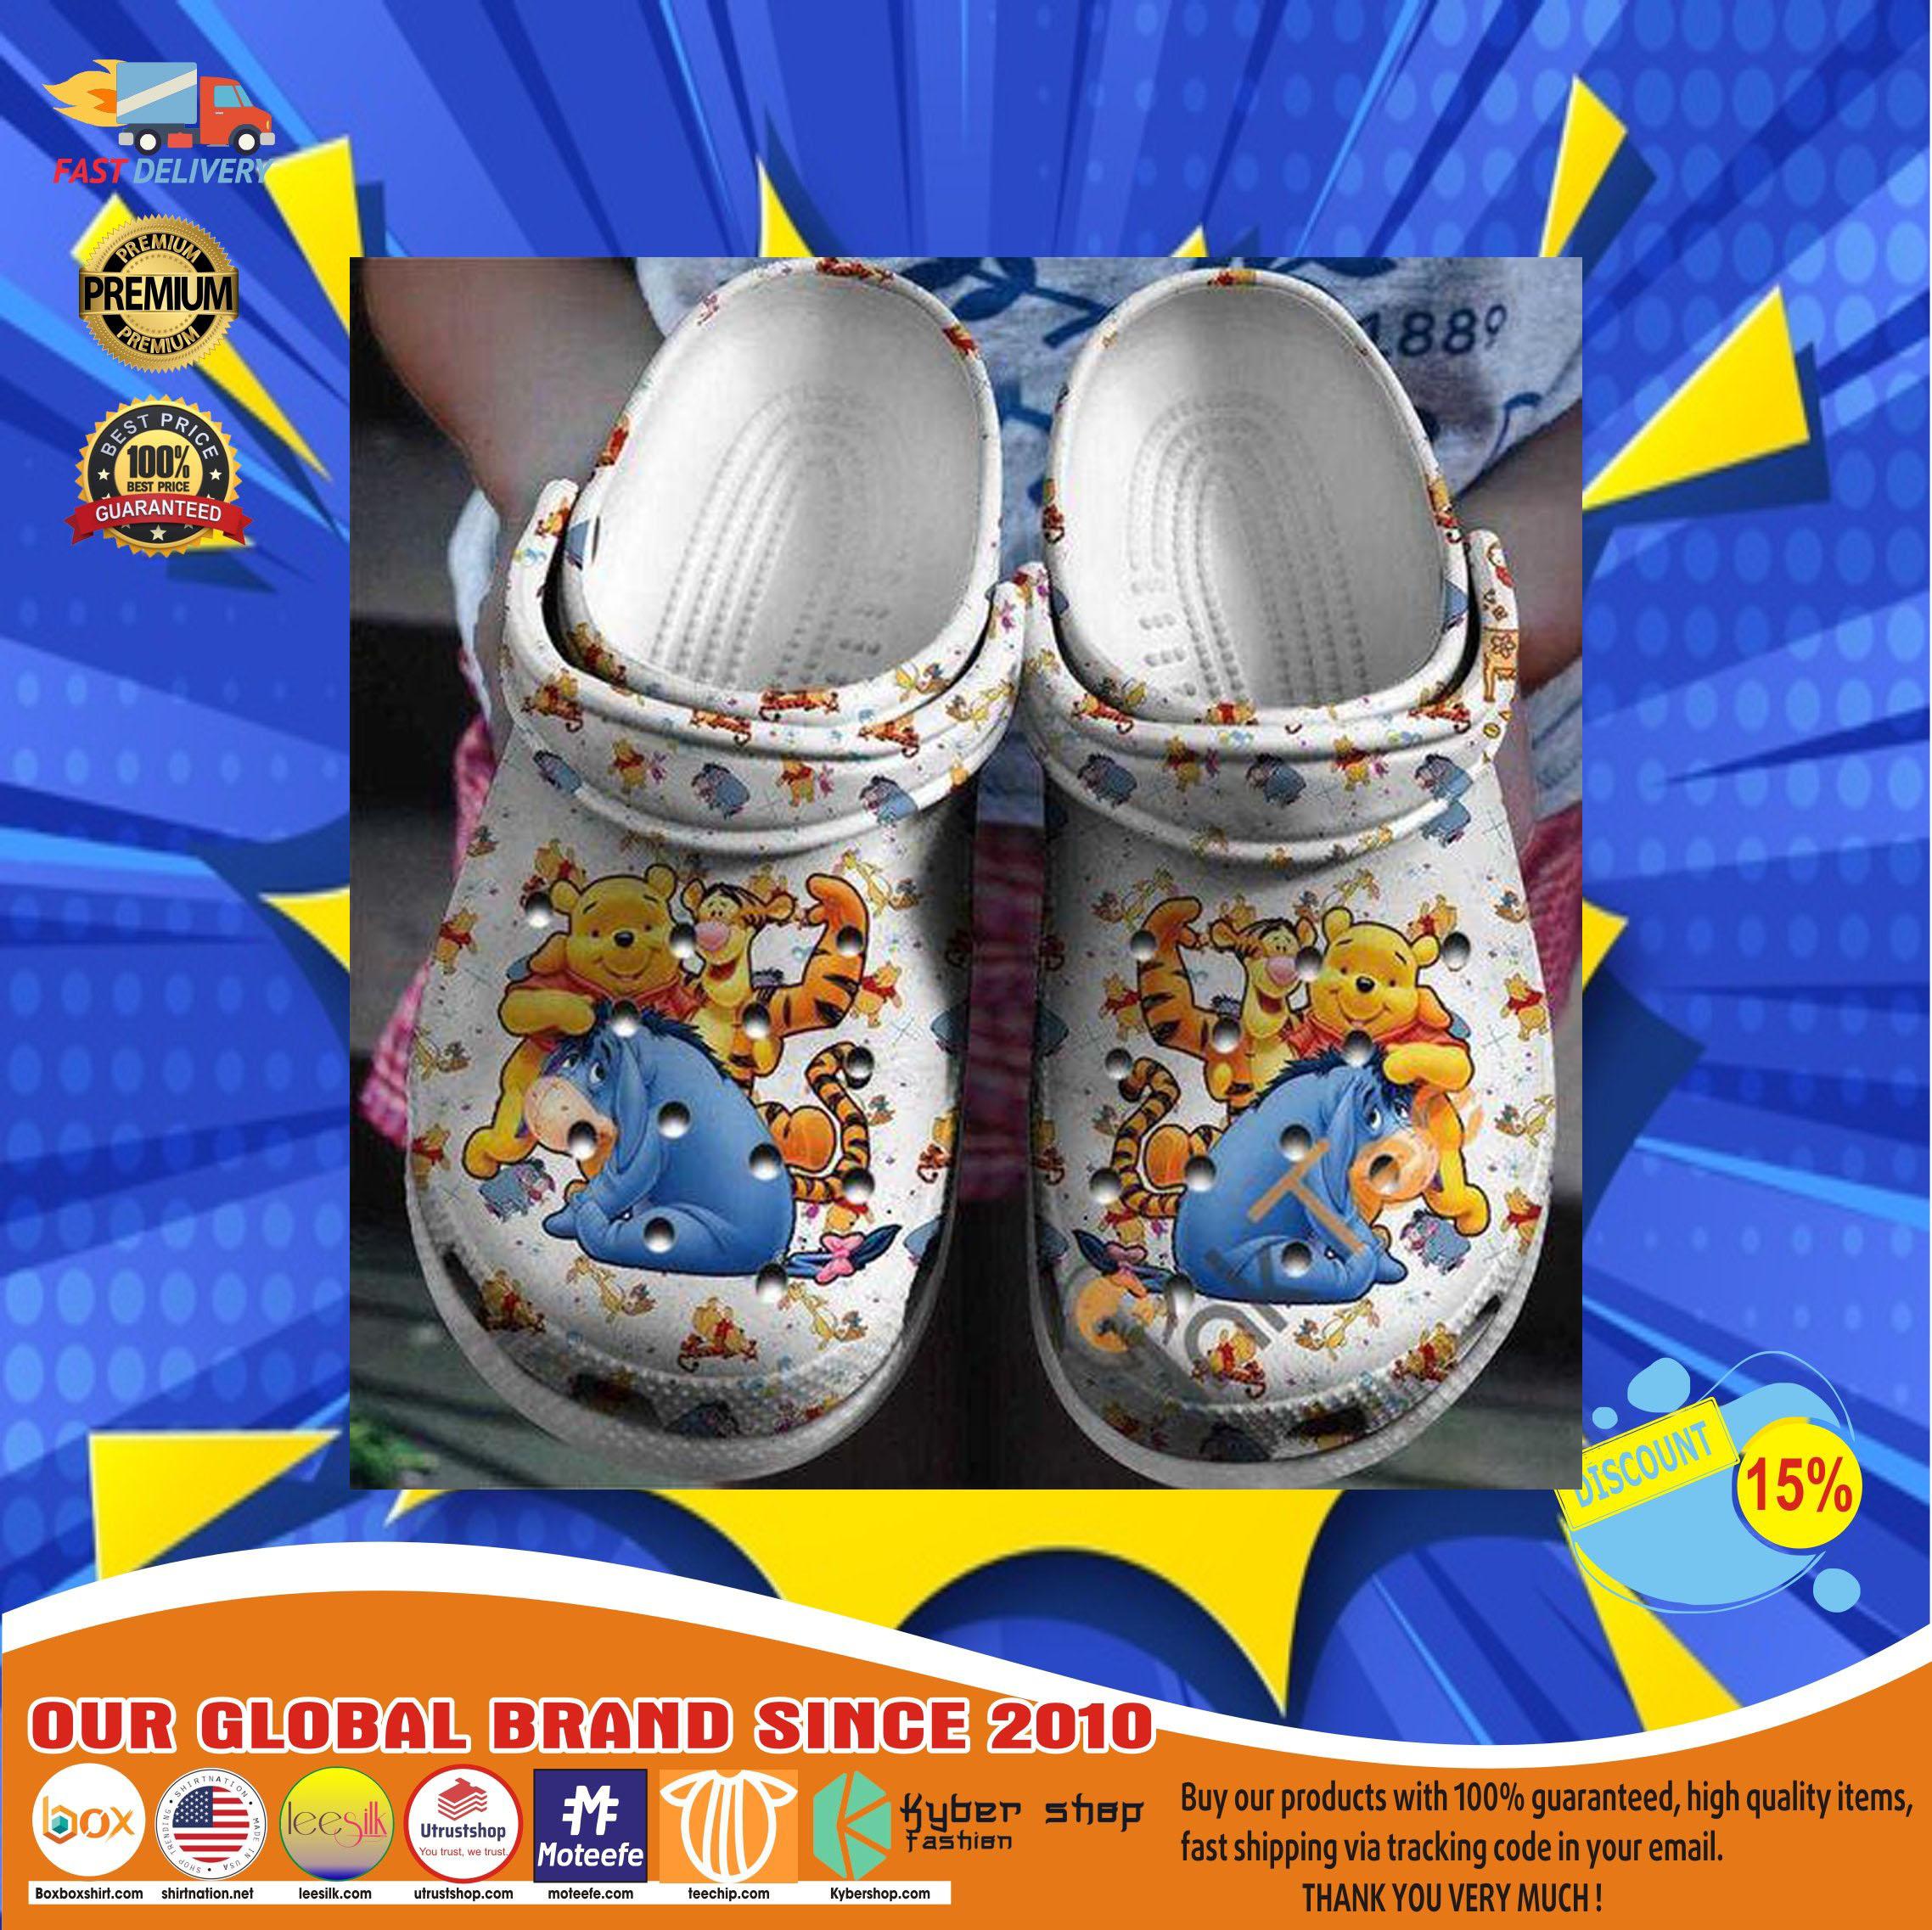 Winnie the pooh crocs clog shoes12